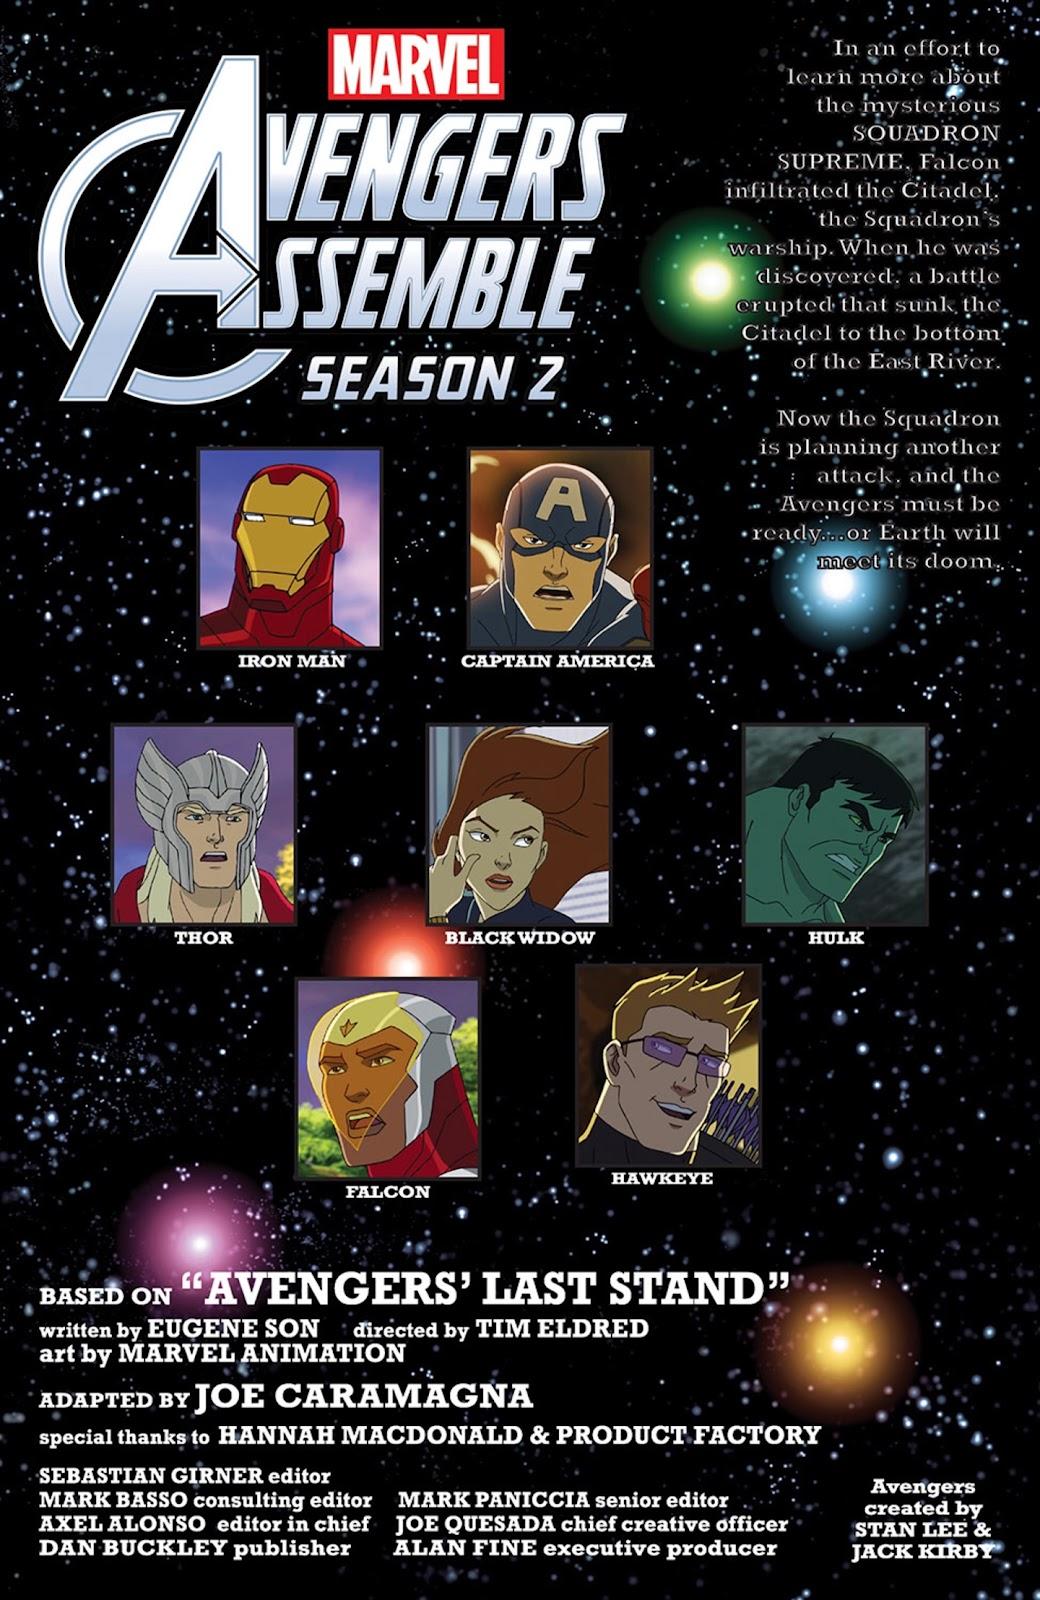 Read online Marvel Universe Avengers Assemble Season 2 comic -  Issue #13 - 3